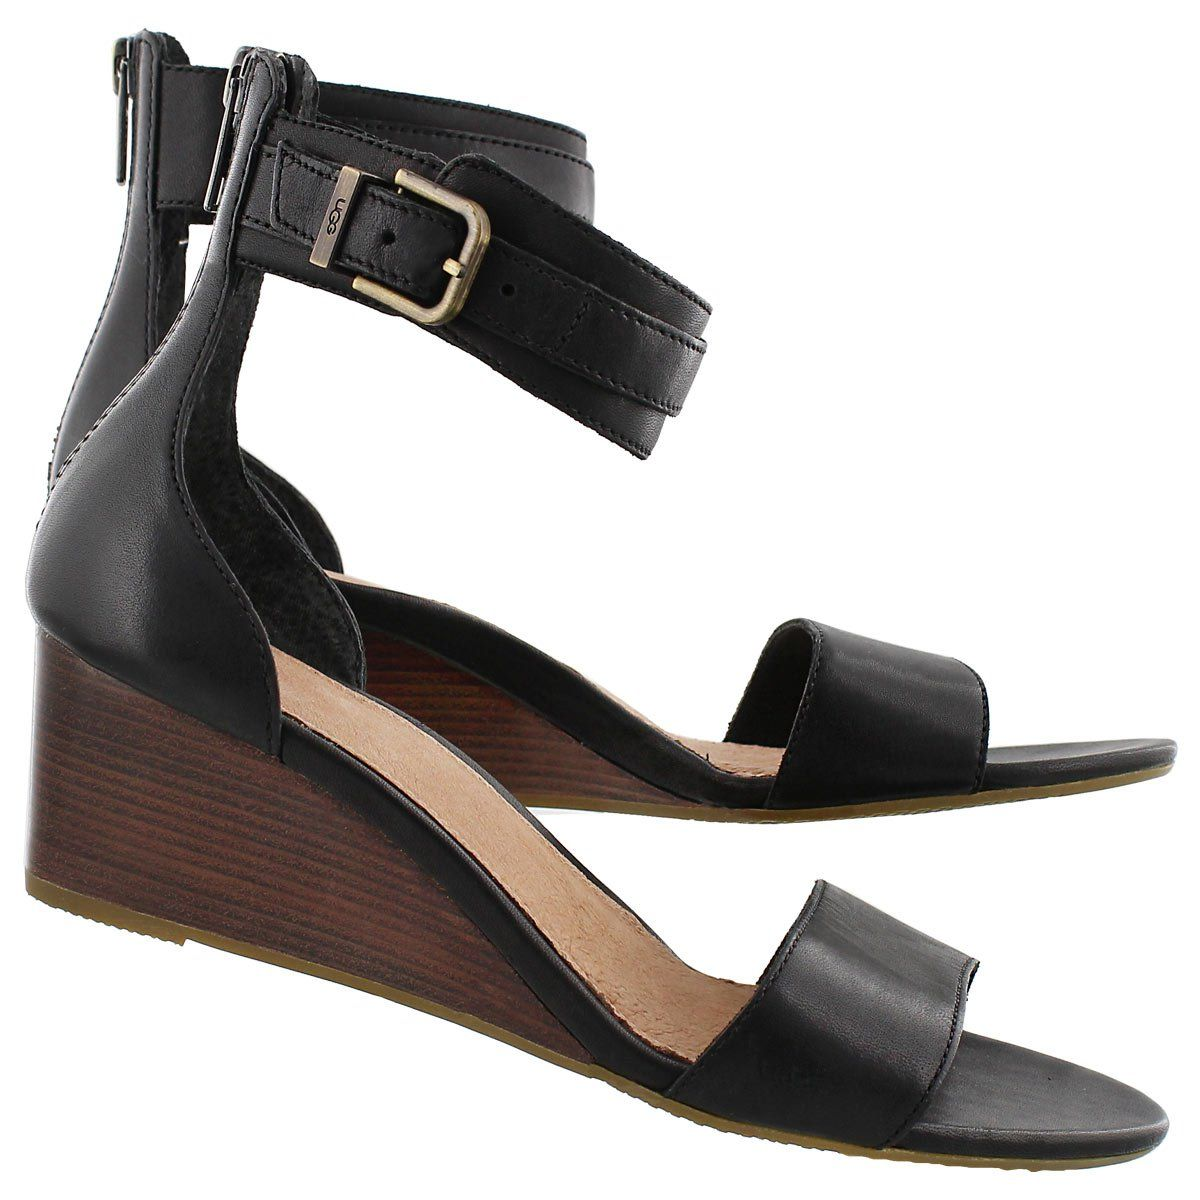 Black sandals with straps - Ugg Australia Women S Char Black Wedge Ankle Strap Sandals 1009708 Blk